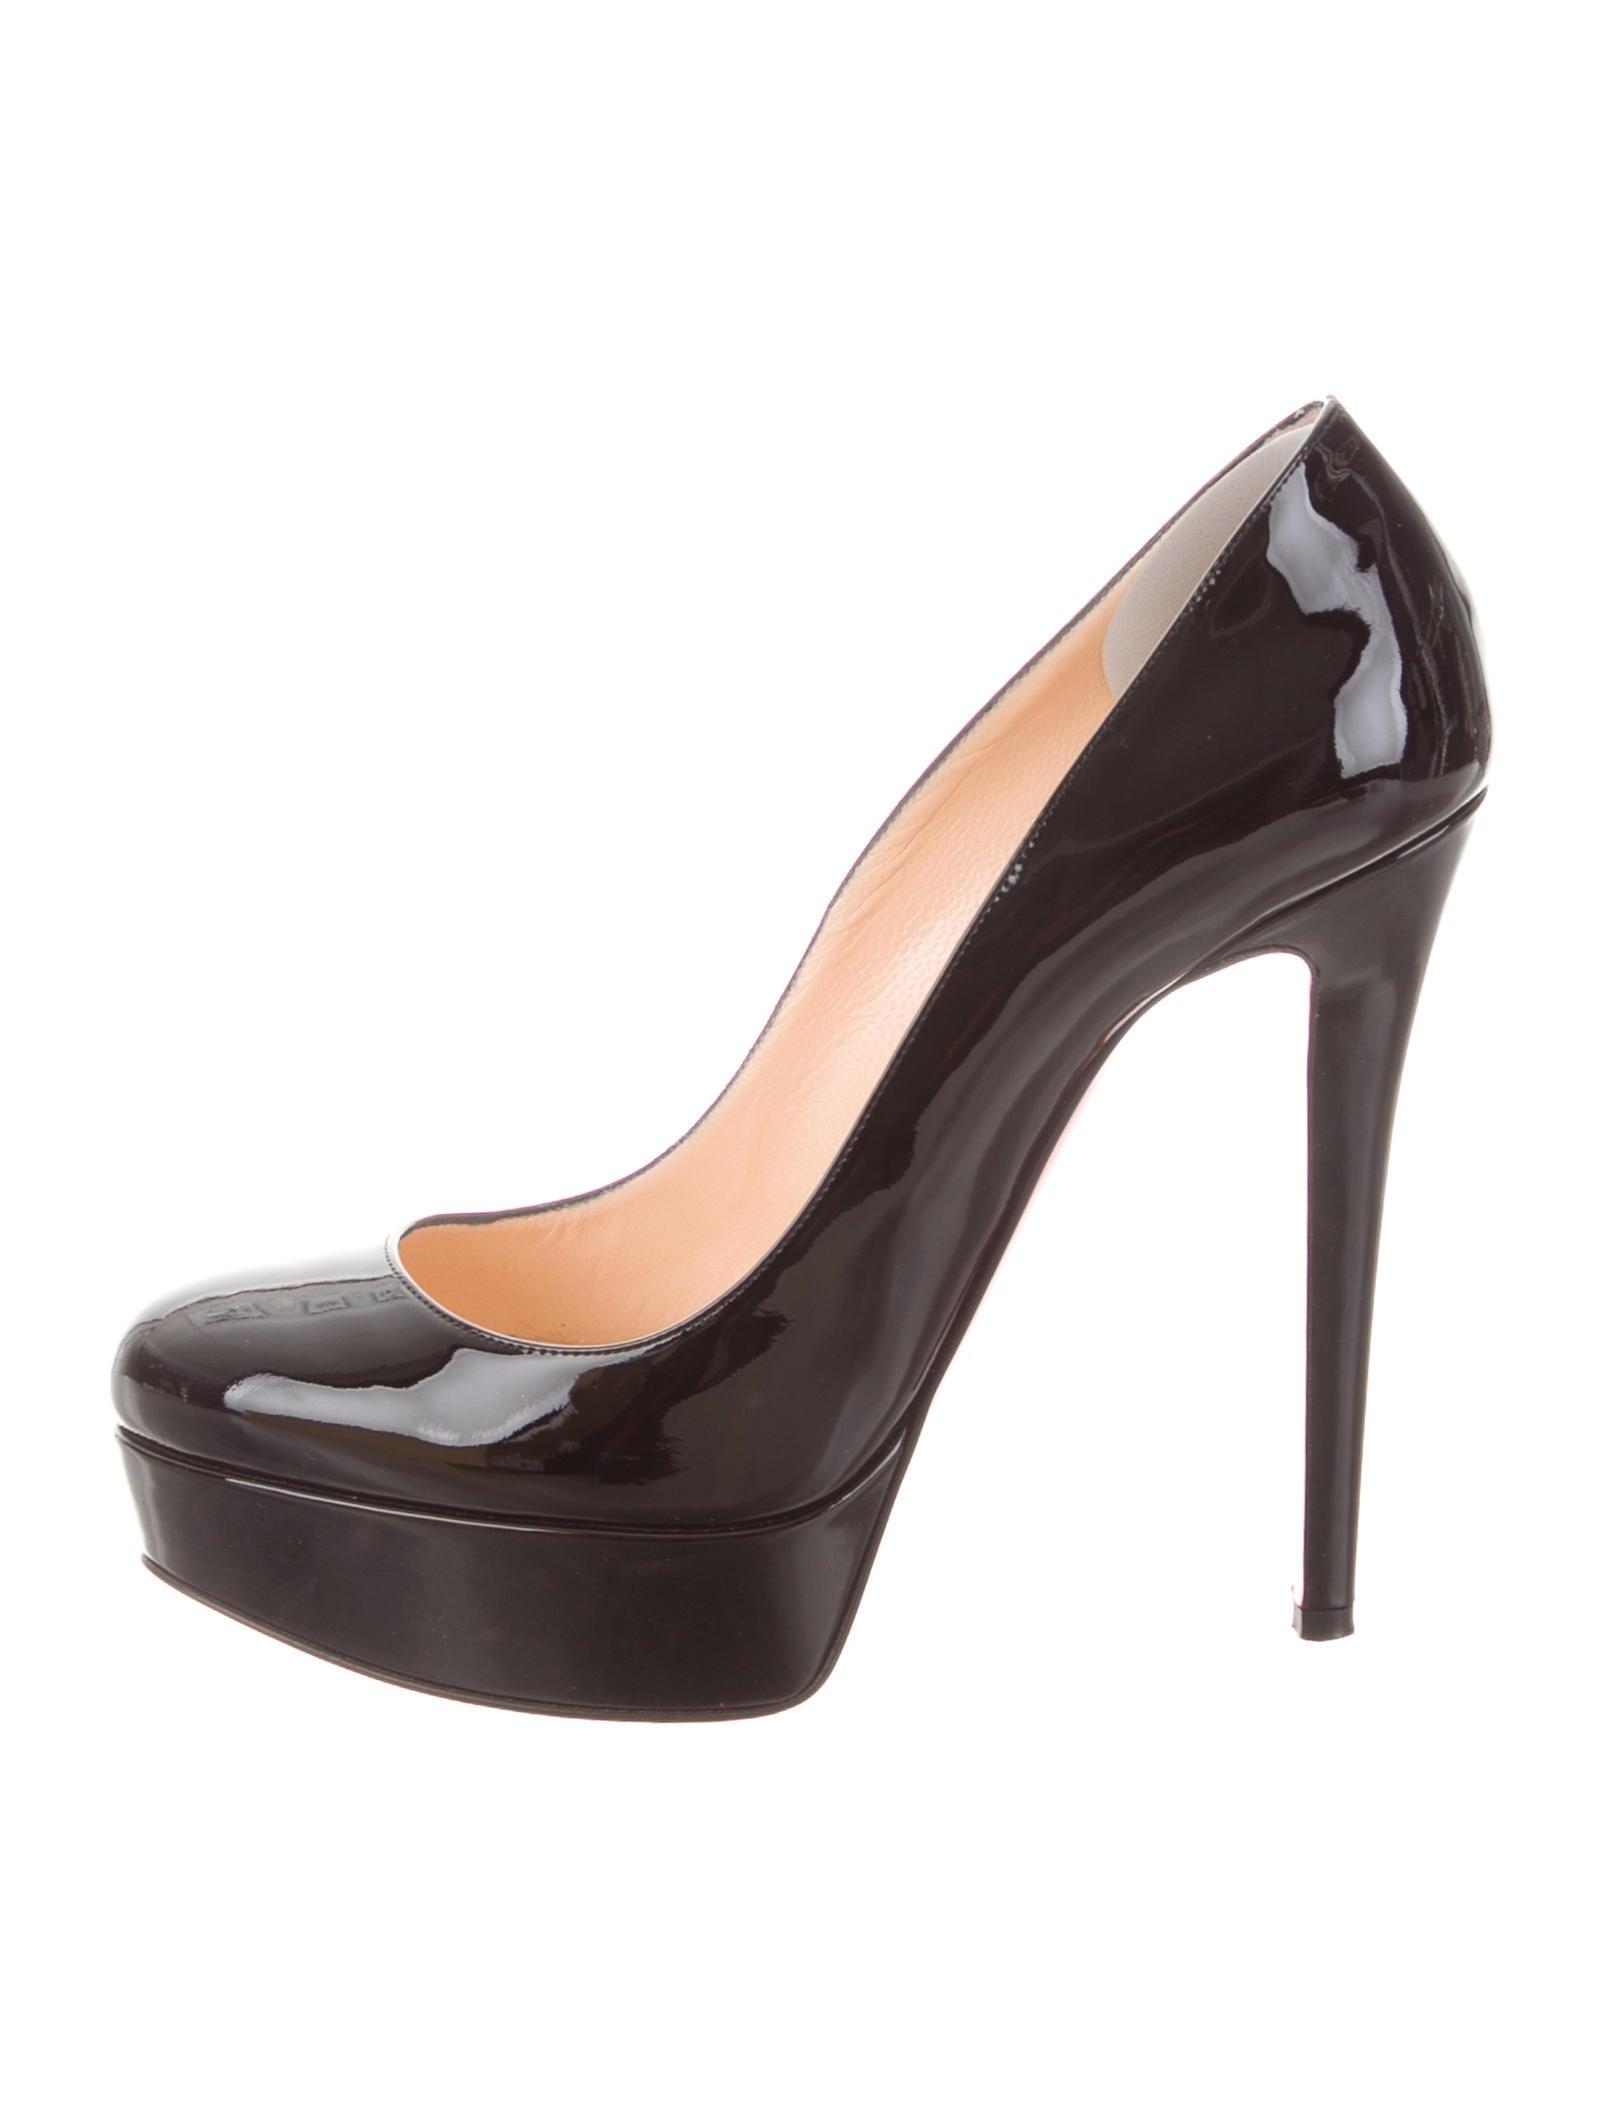 7c7057183 Christian Louboutin Bianca Patent Pumps - Shoes - CHT108752 | The ...